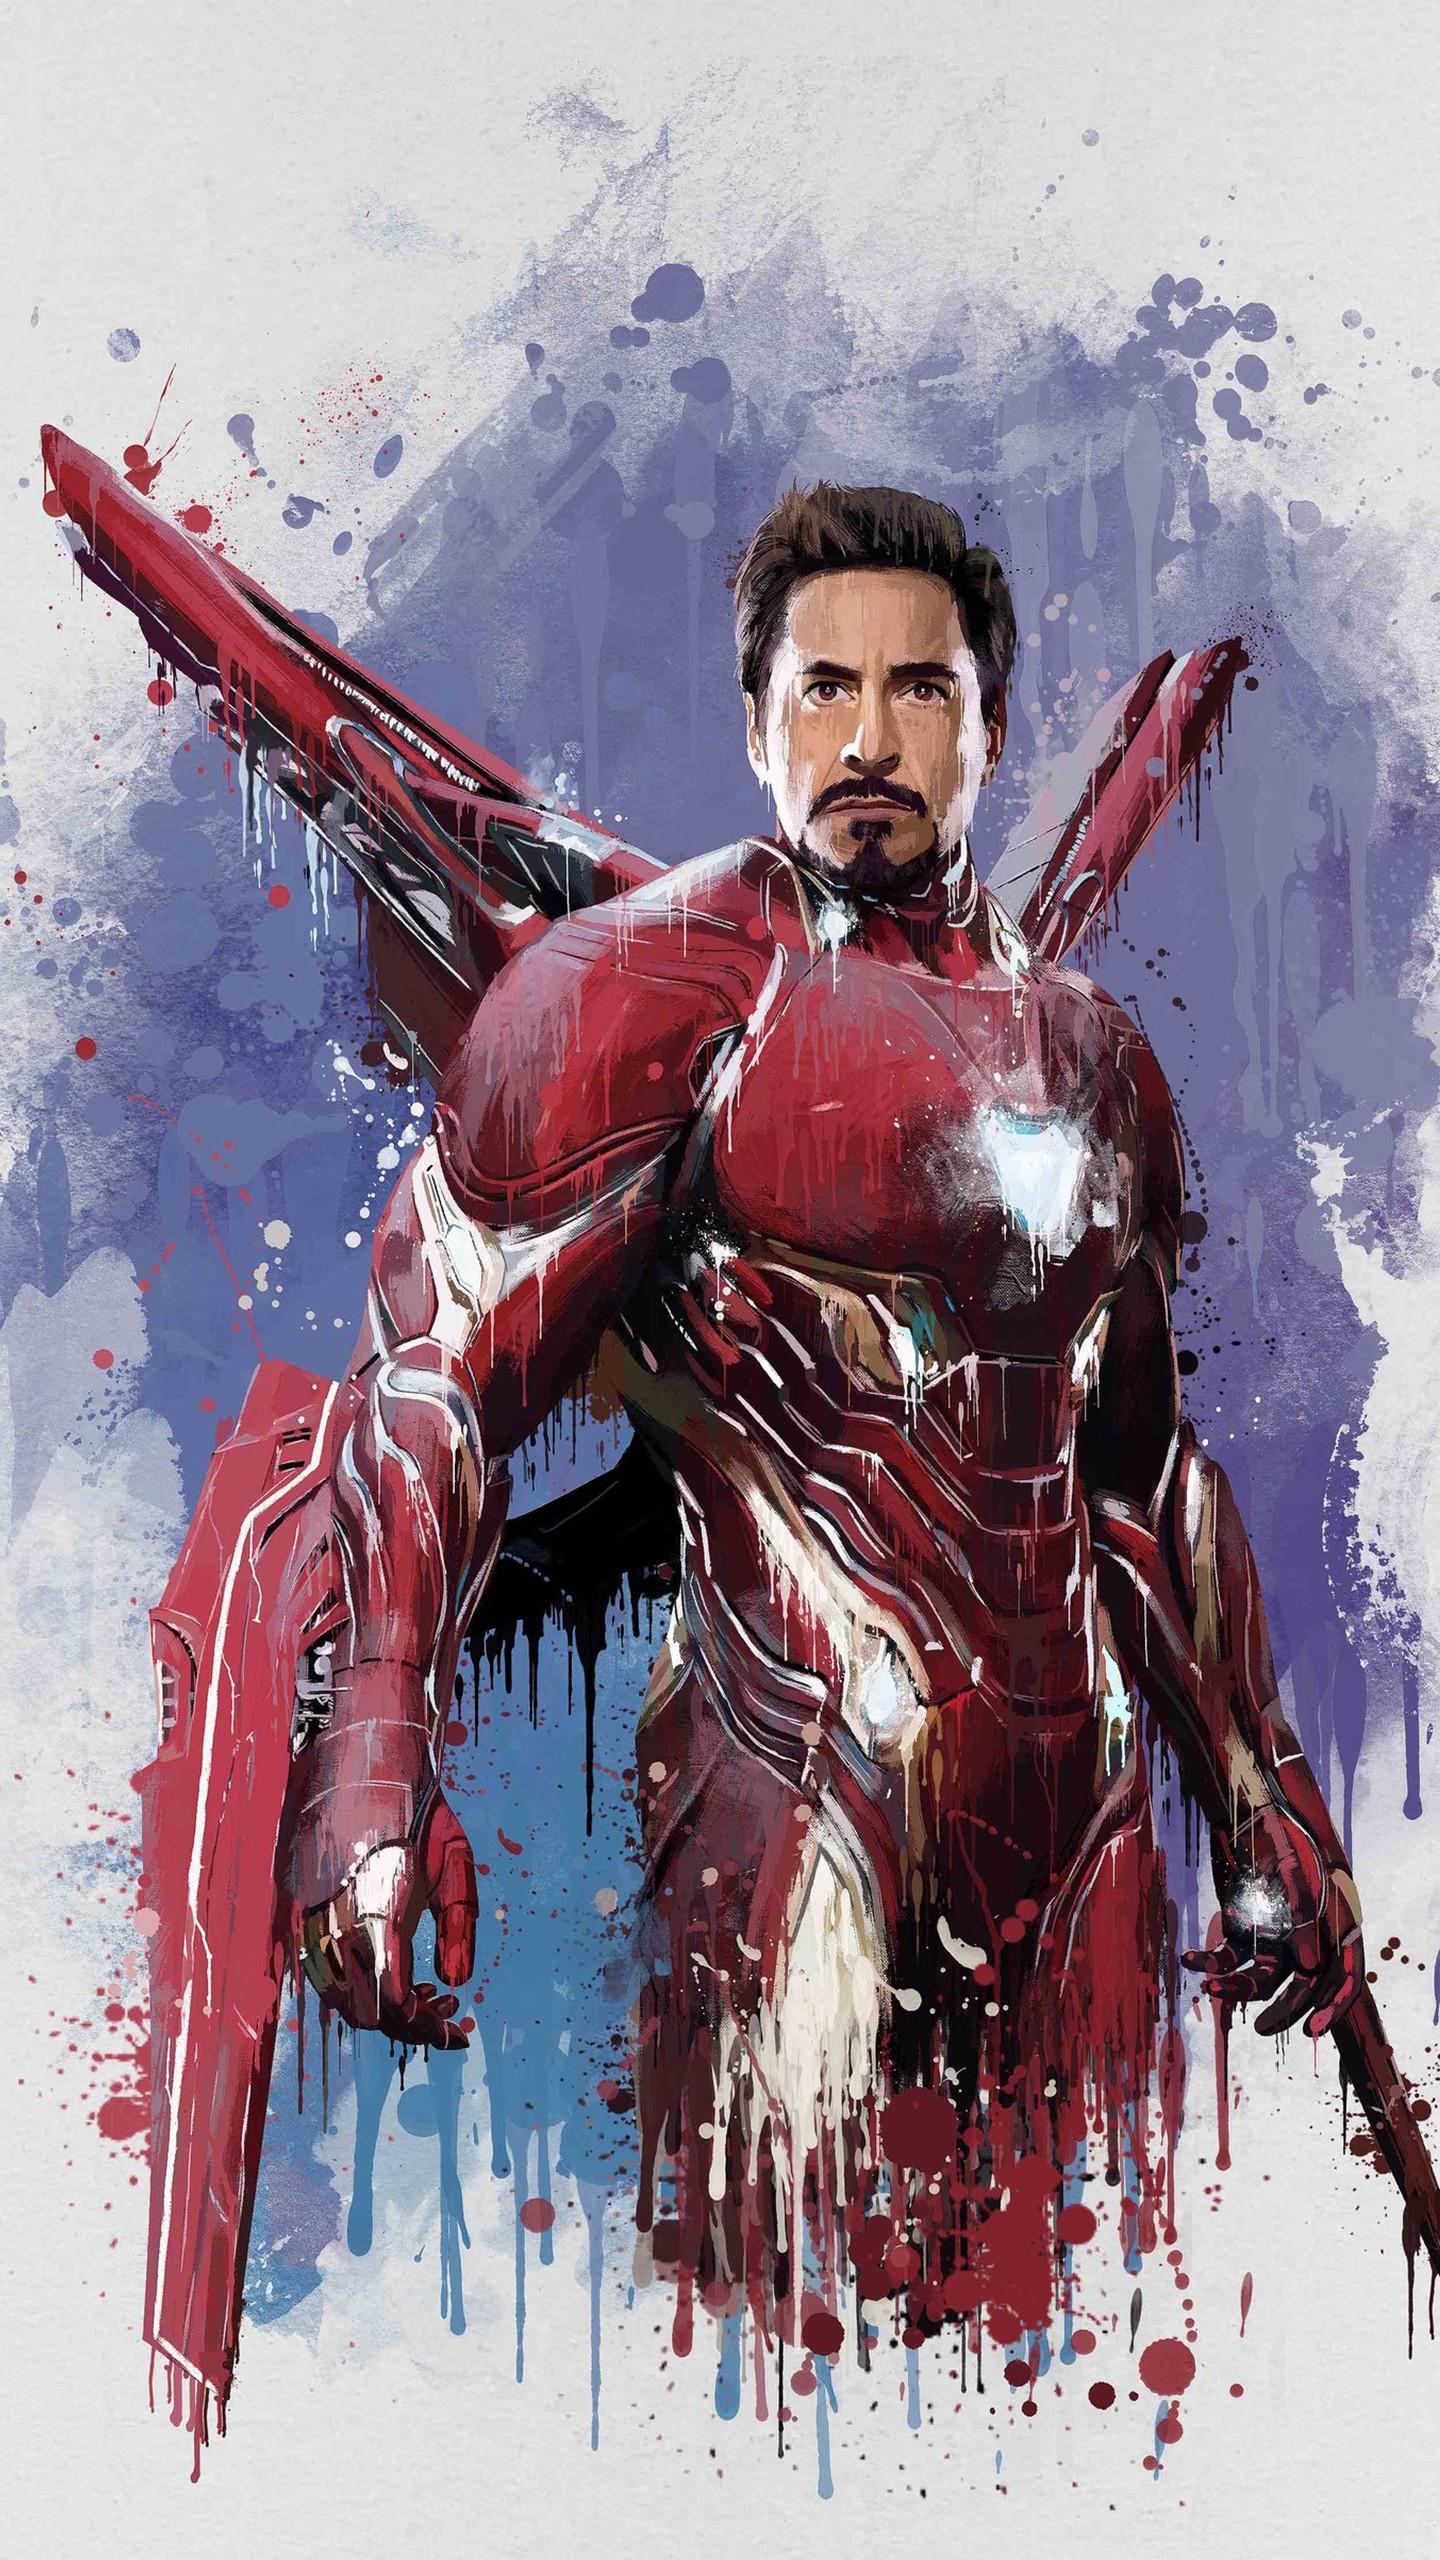 Mayank 3d Wallpaper Iron Man Avengers Infinity War Suit Wallpapers Hd